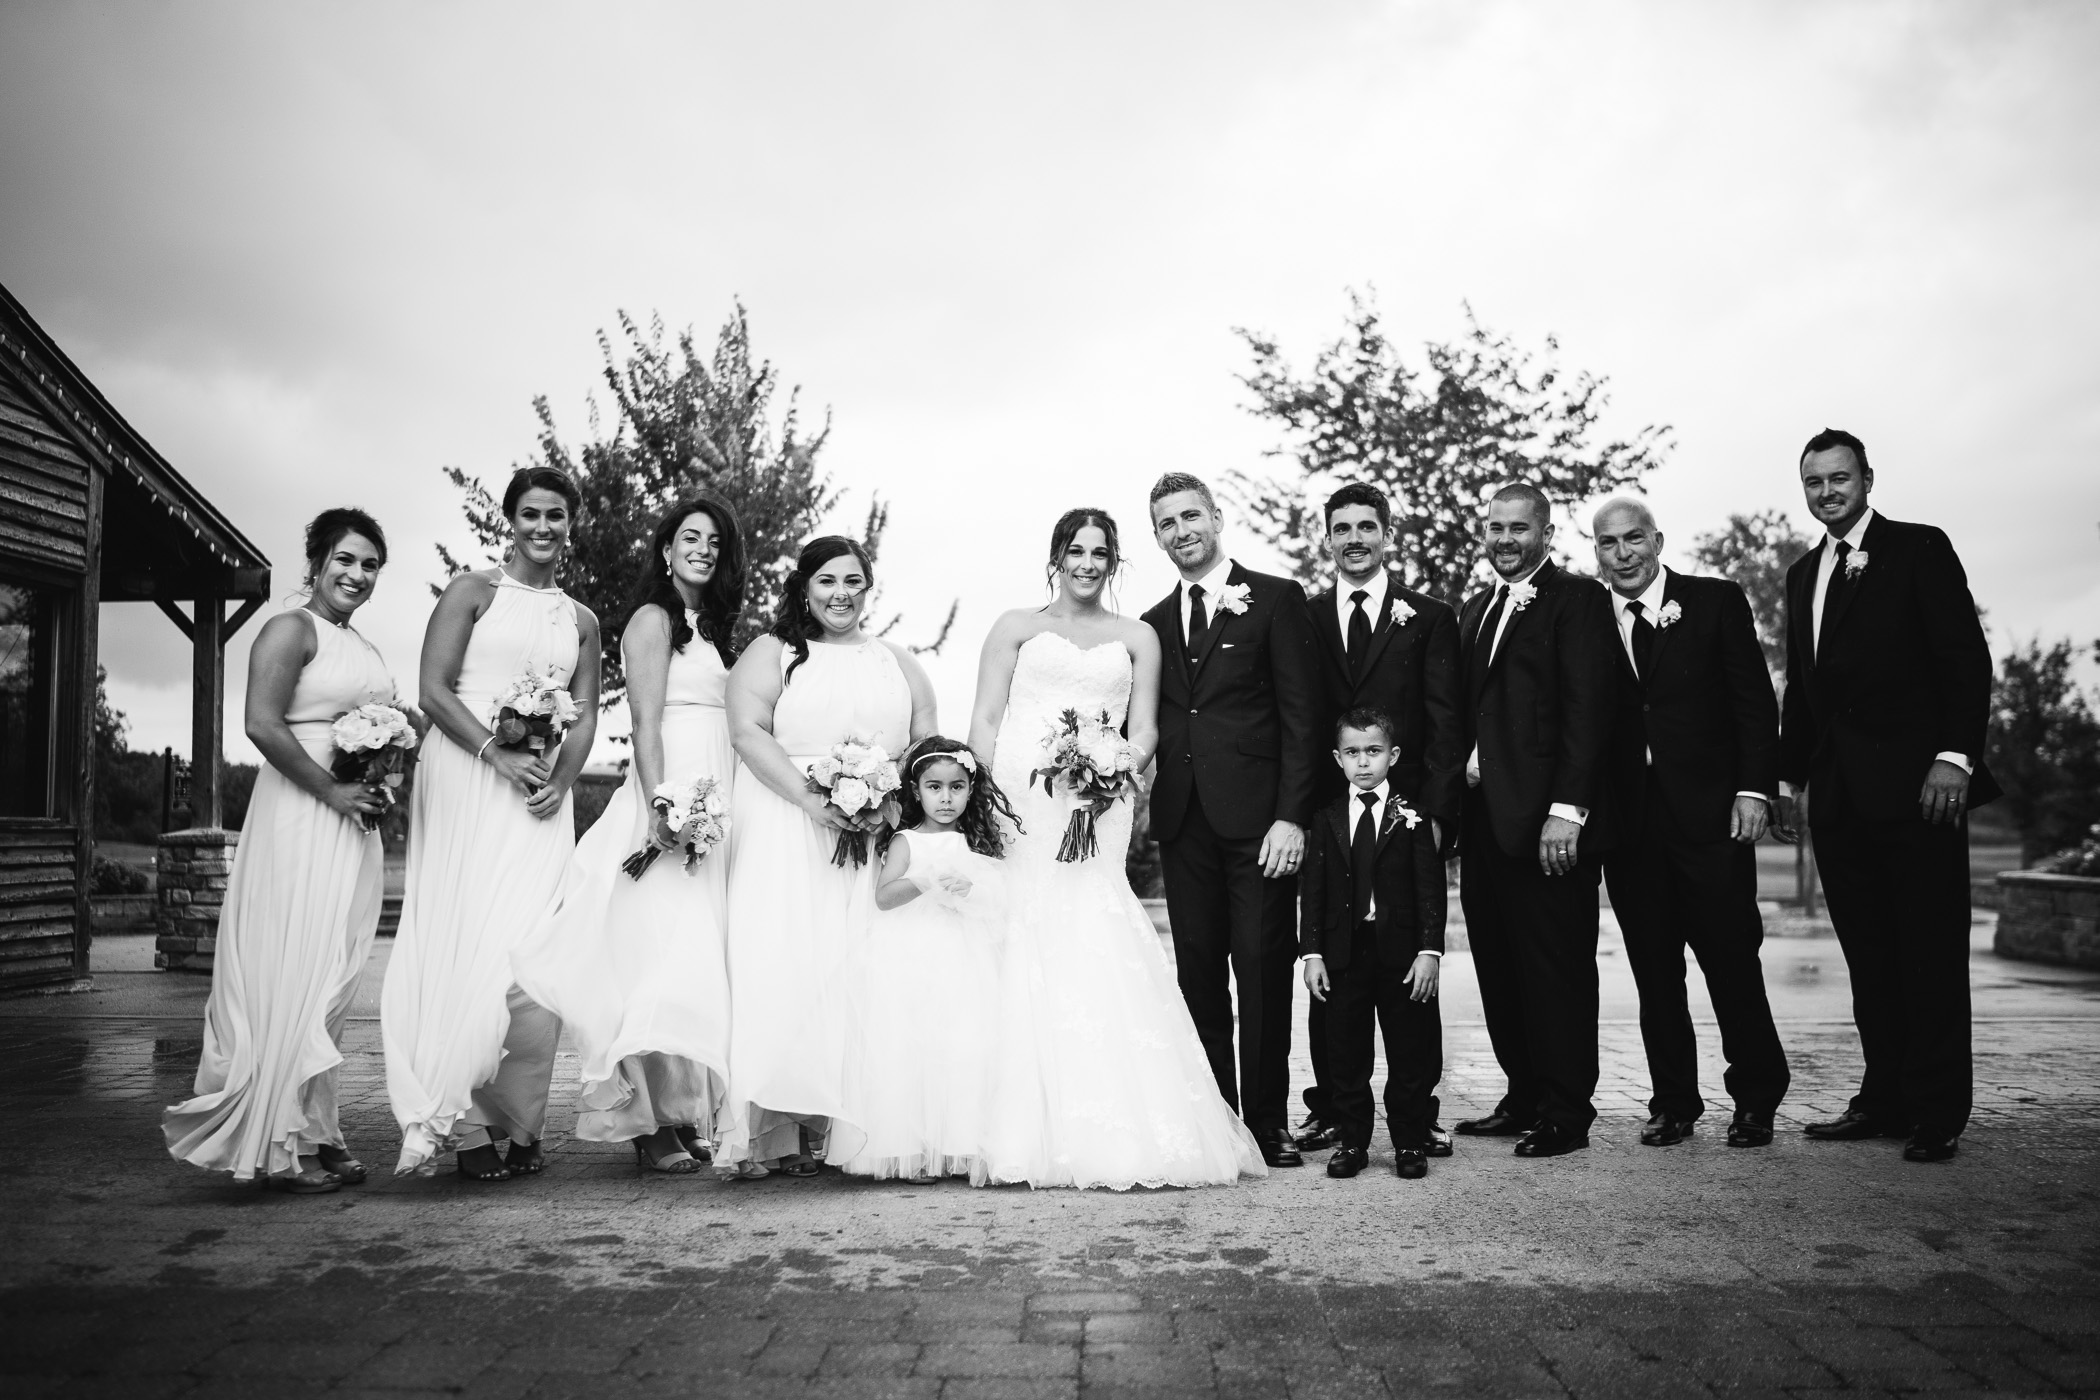 Marie and Steve - Breezy Bend Wedding - Cojo Photo-1115.jpg